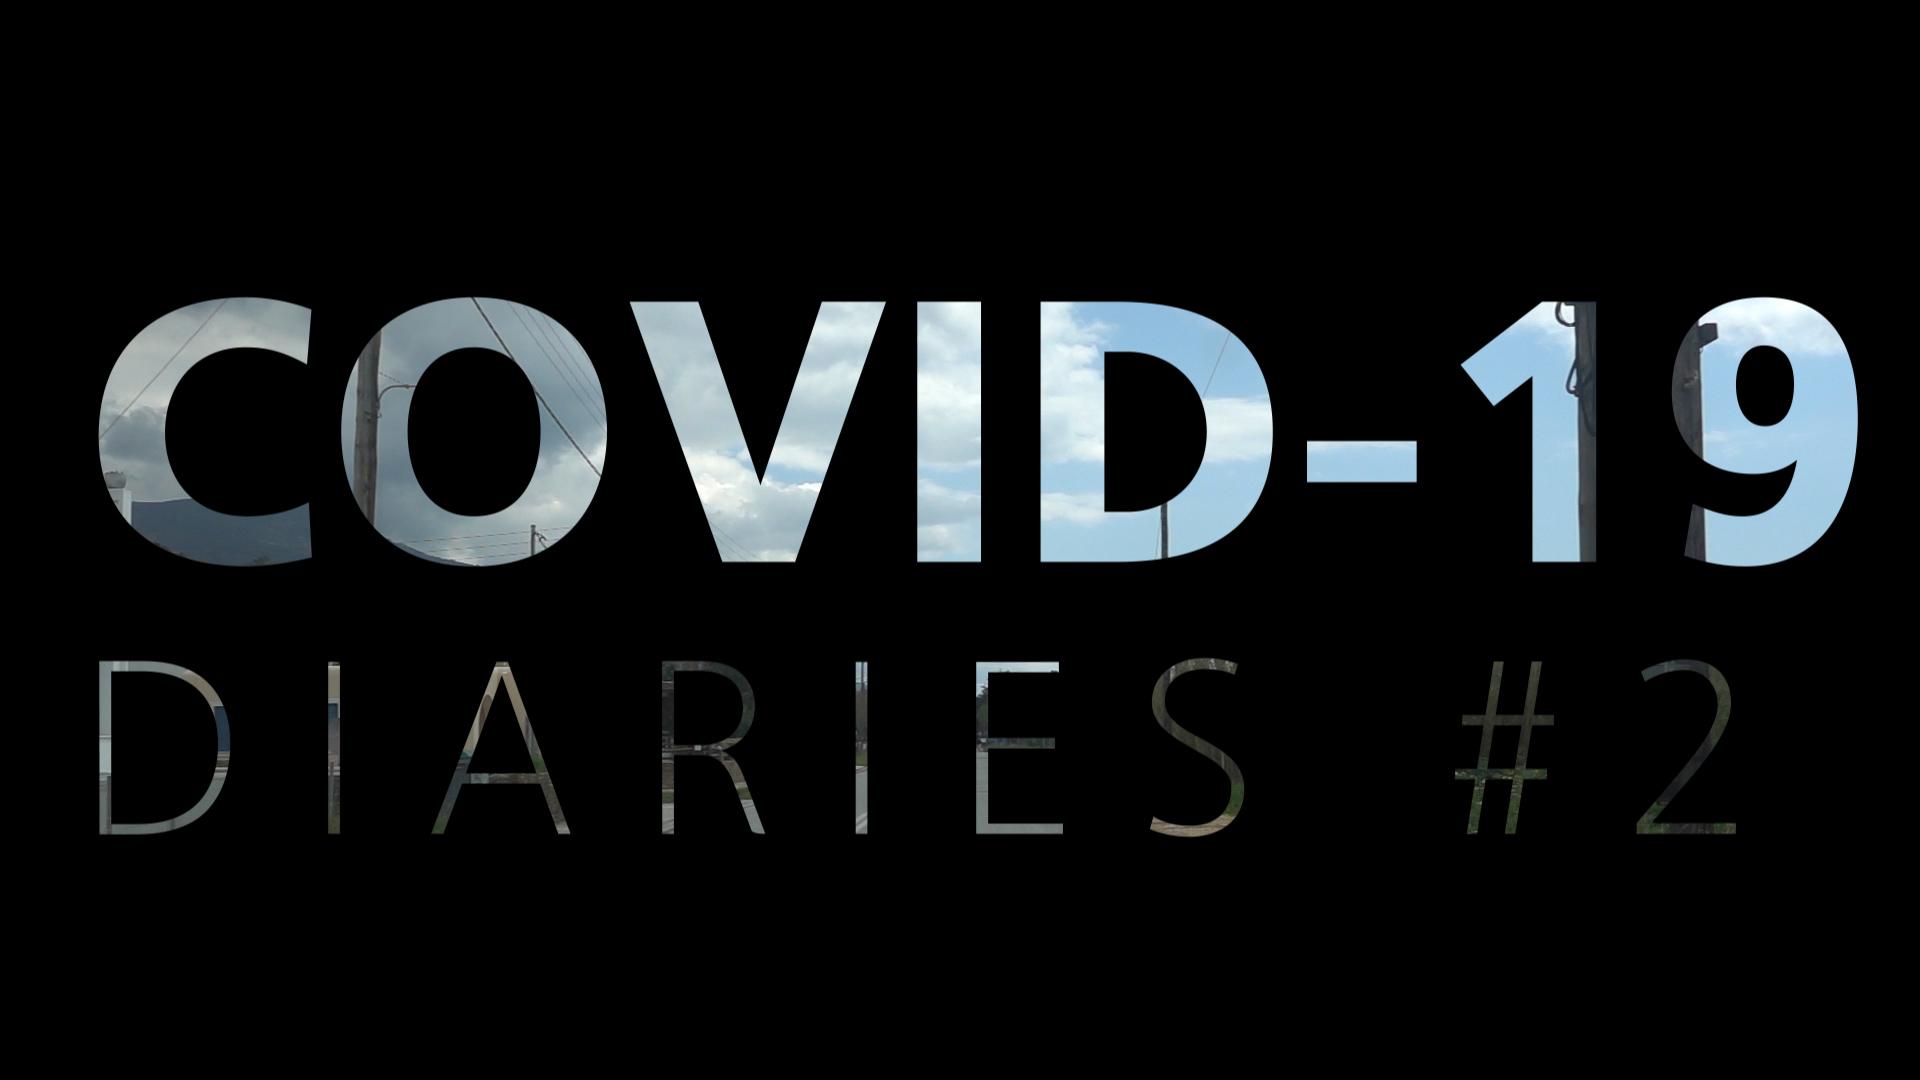 COVID-19 DIARIES #2